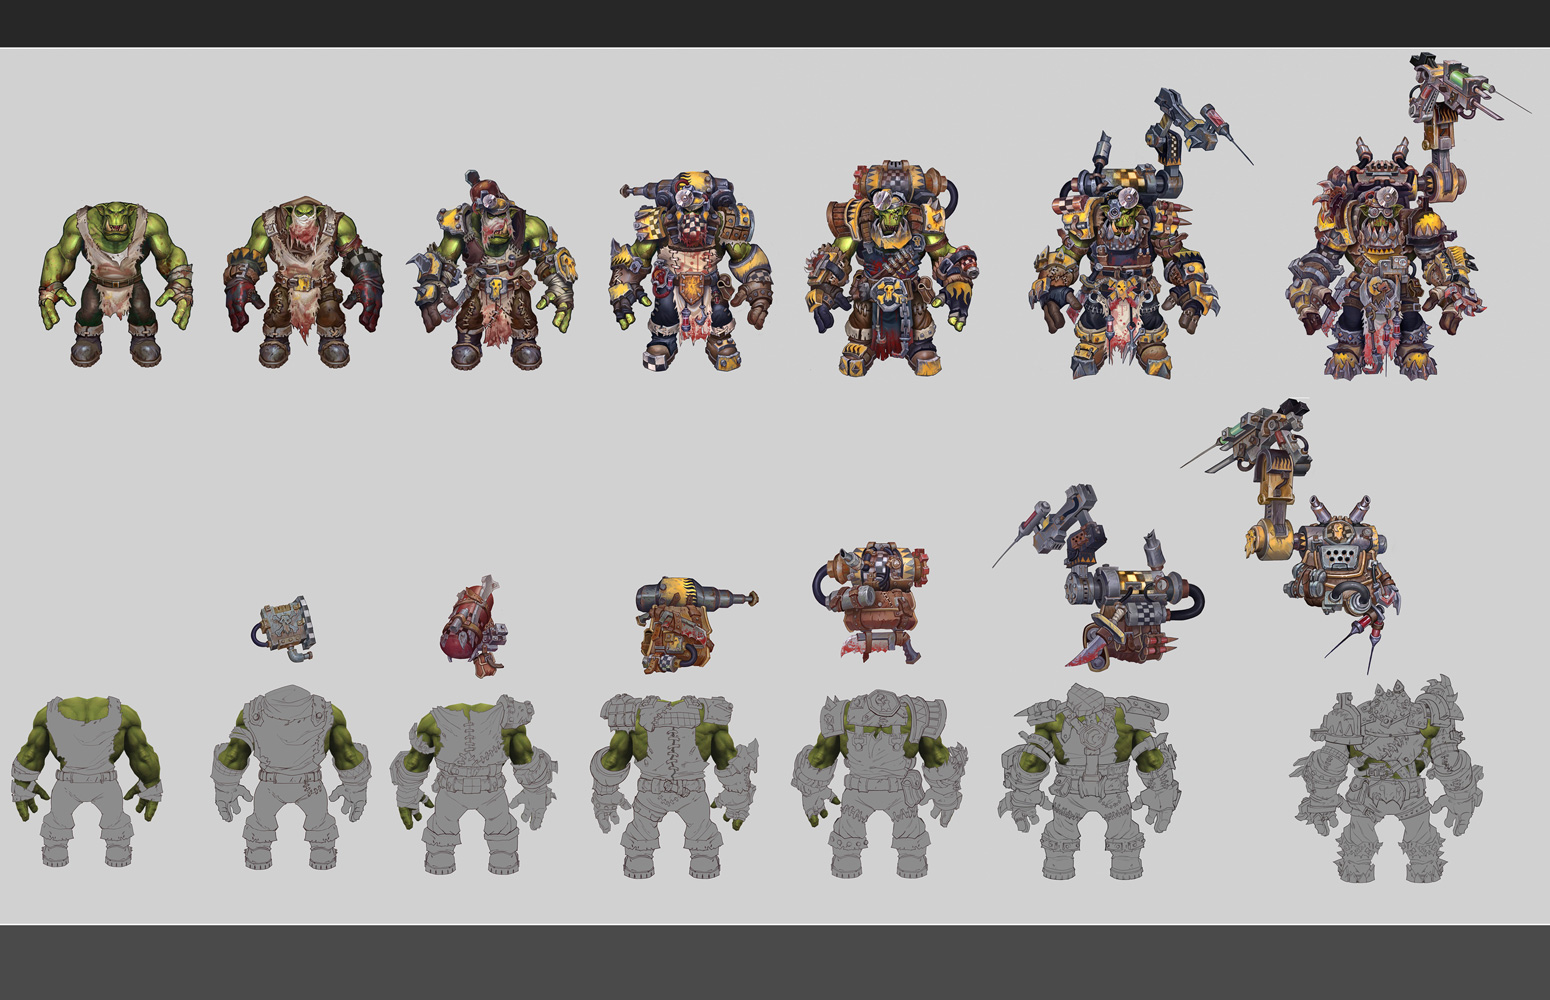 [E3] Eternal Crusade, un MMO Warhammer 40K - Page 3 16